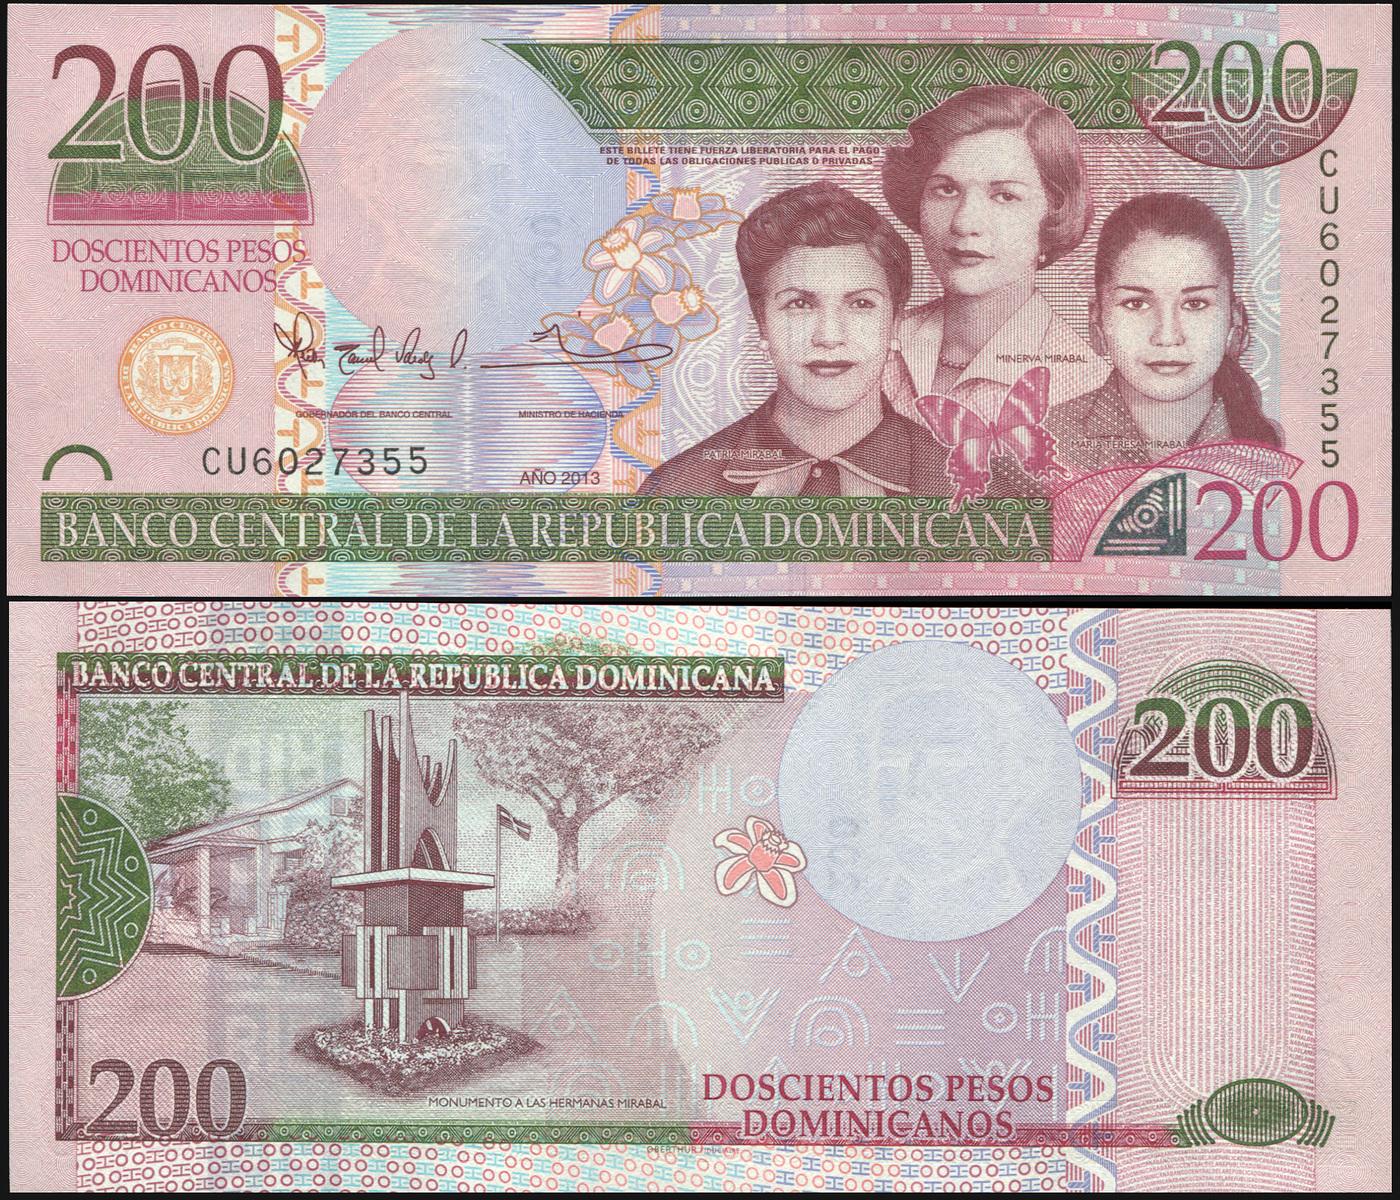 Банкнота. Доминиканская республика 200 песо доминикано. 2013 UNC. Кат.P.185a